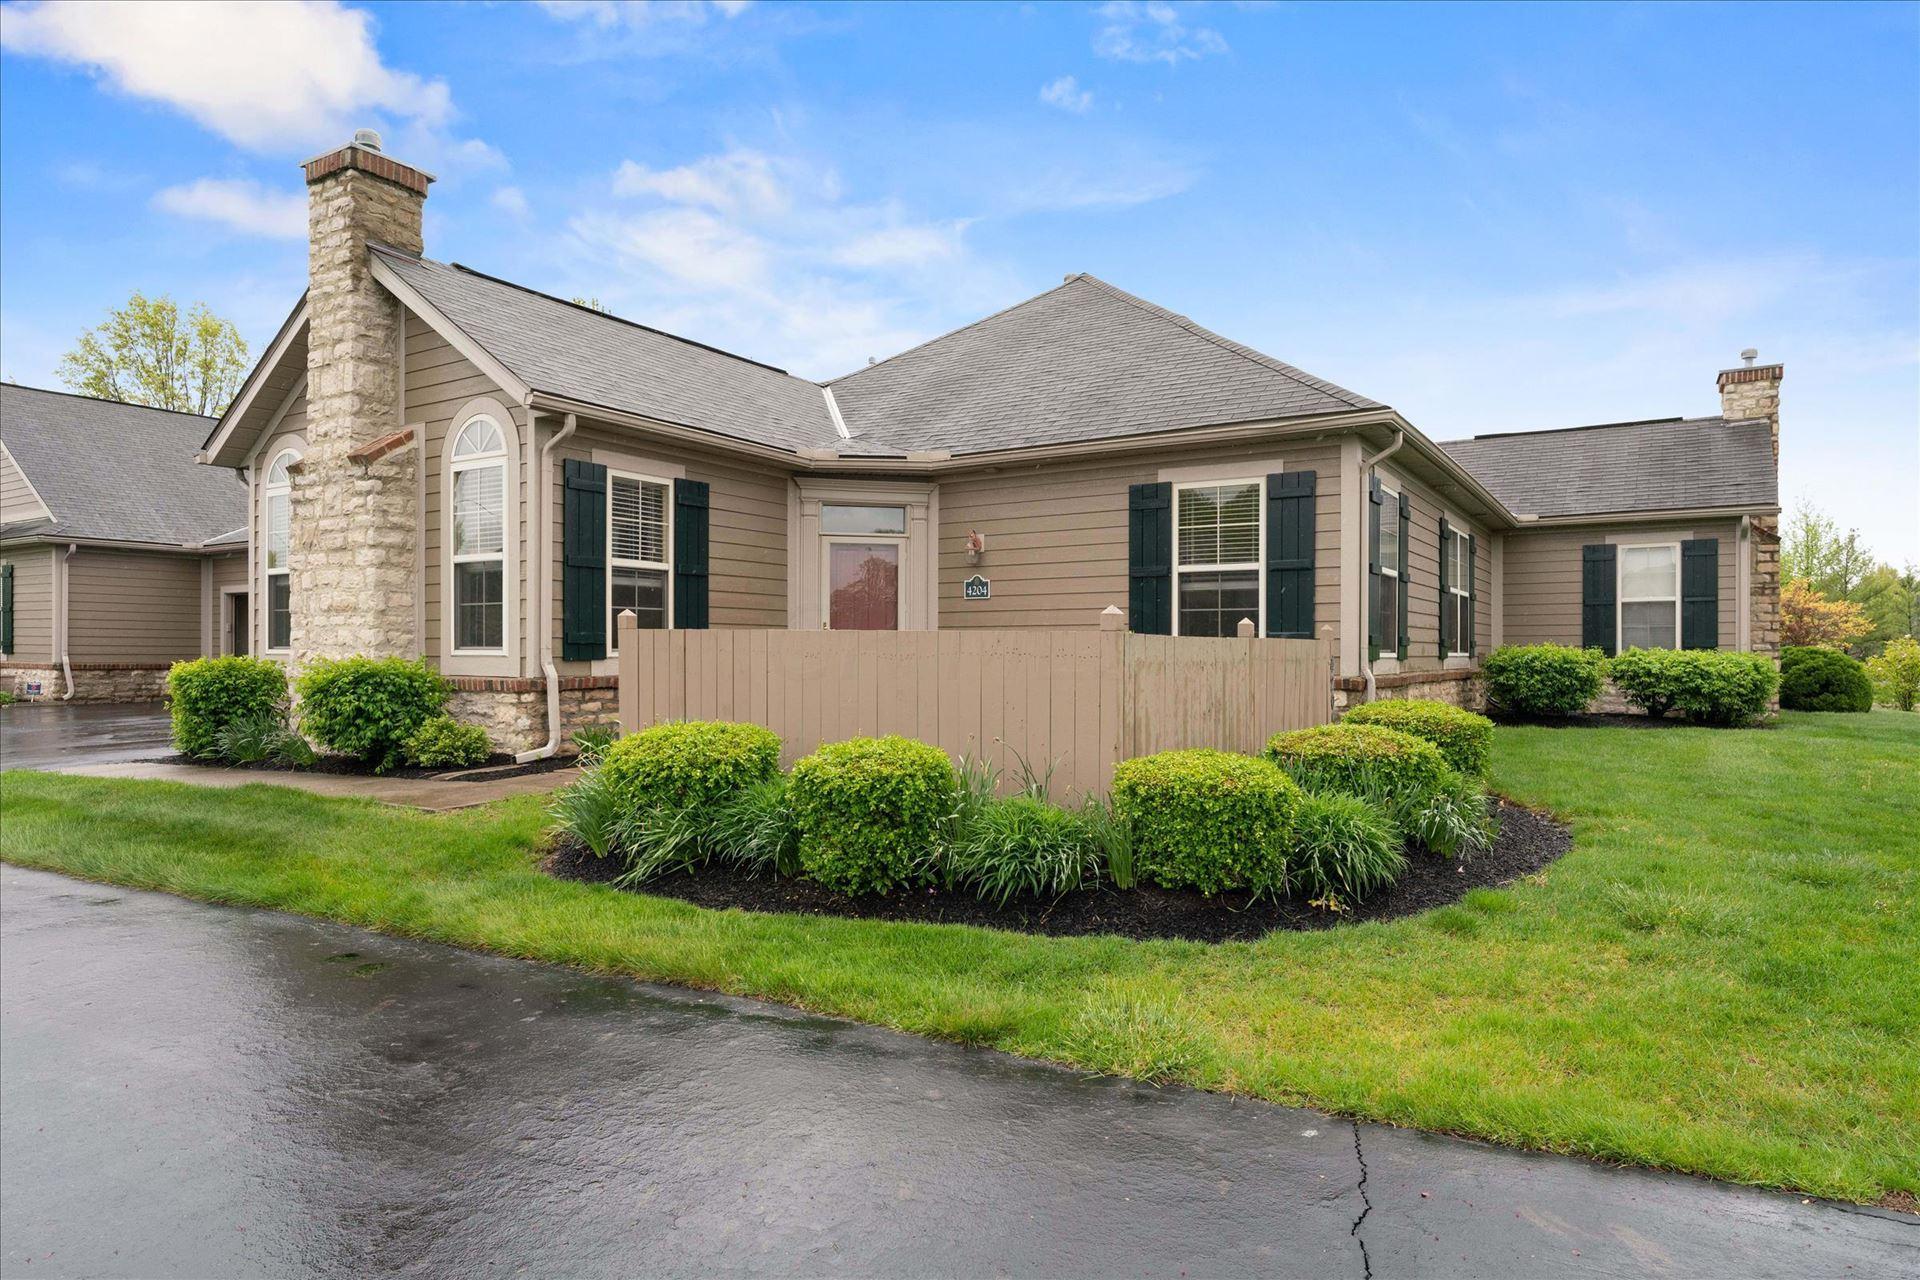 Photo of 4204 Windbud Drive #7-4204, New Albany, OH 43054 (MLS # 221015172)